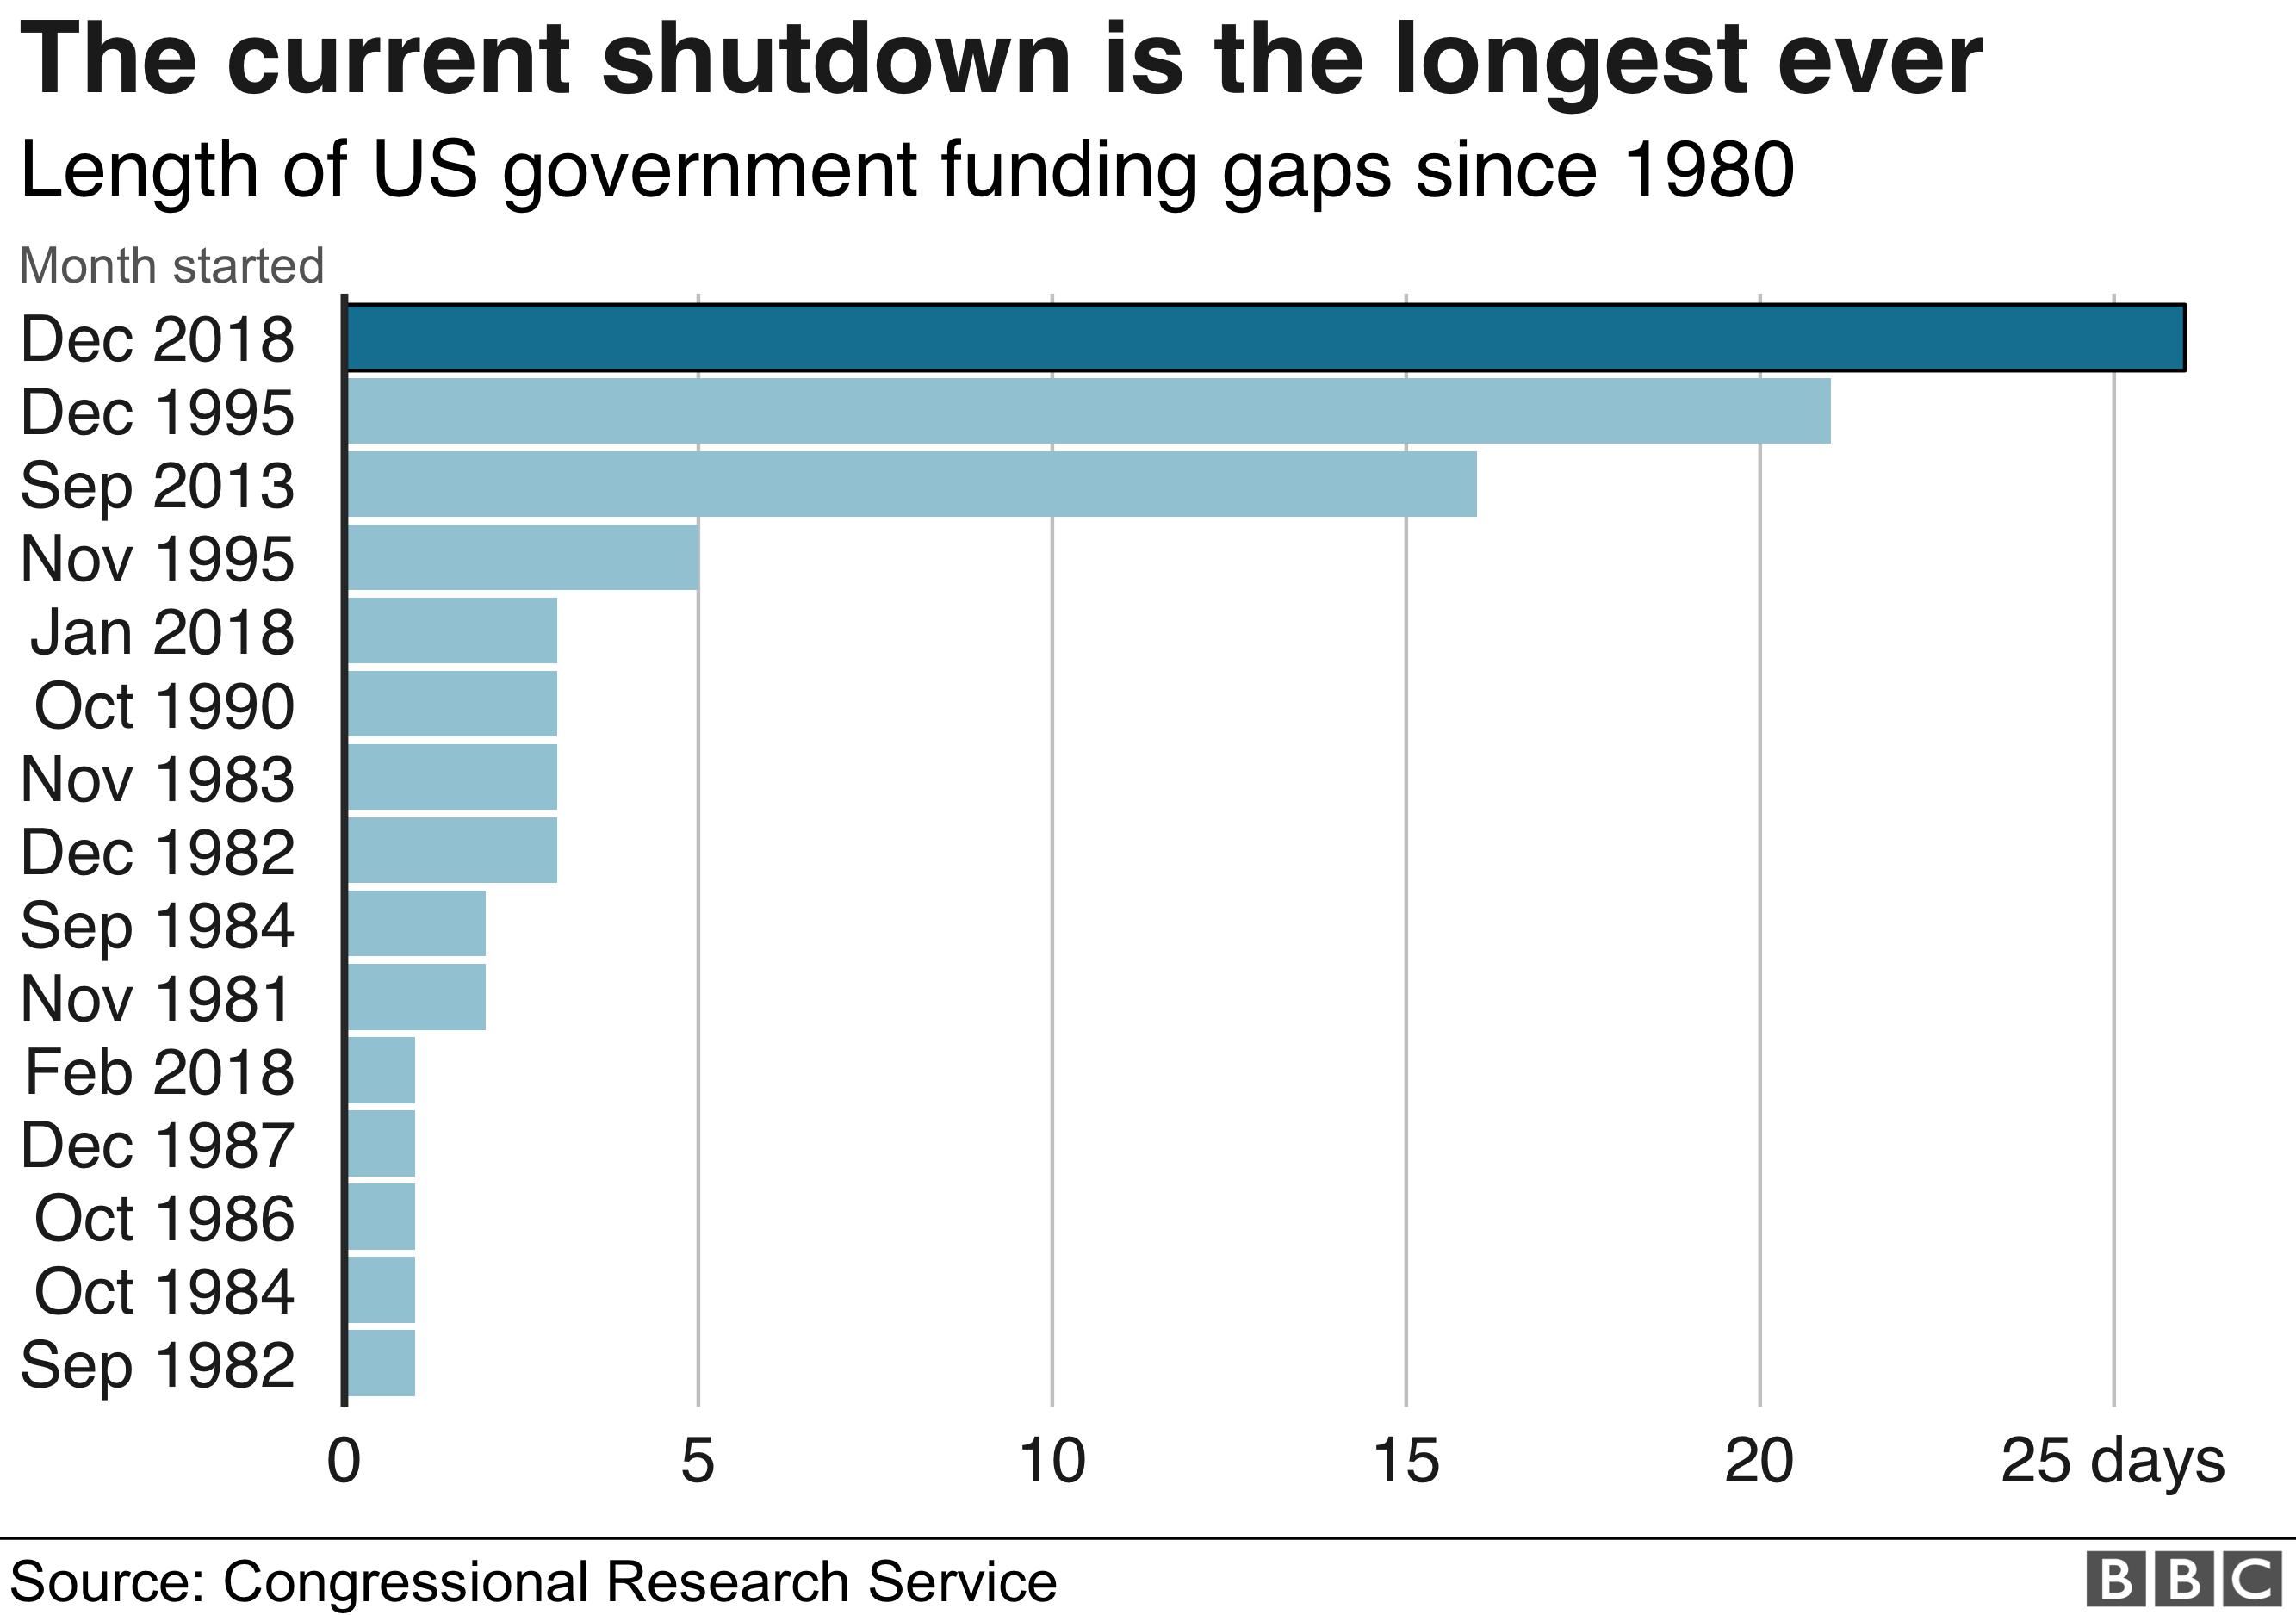 Graph of shutdown length